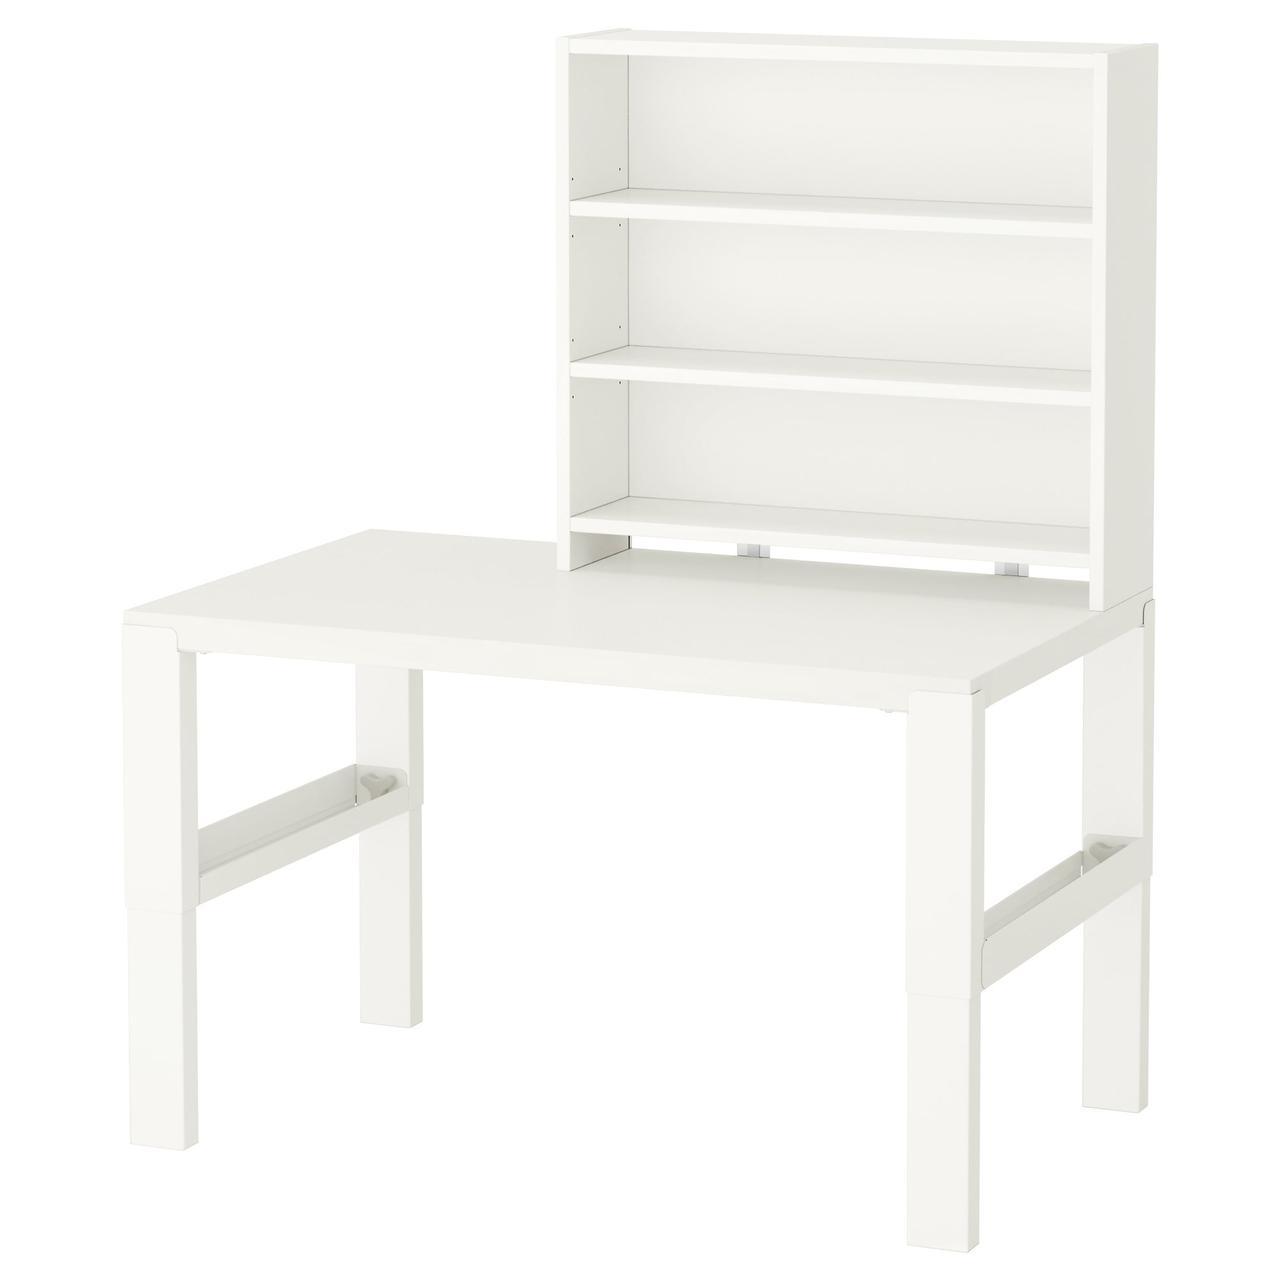 IKEA PAHL (691.289.92) Письменн стол с полками